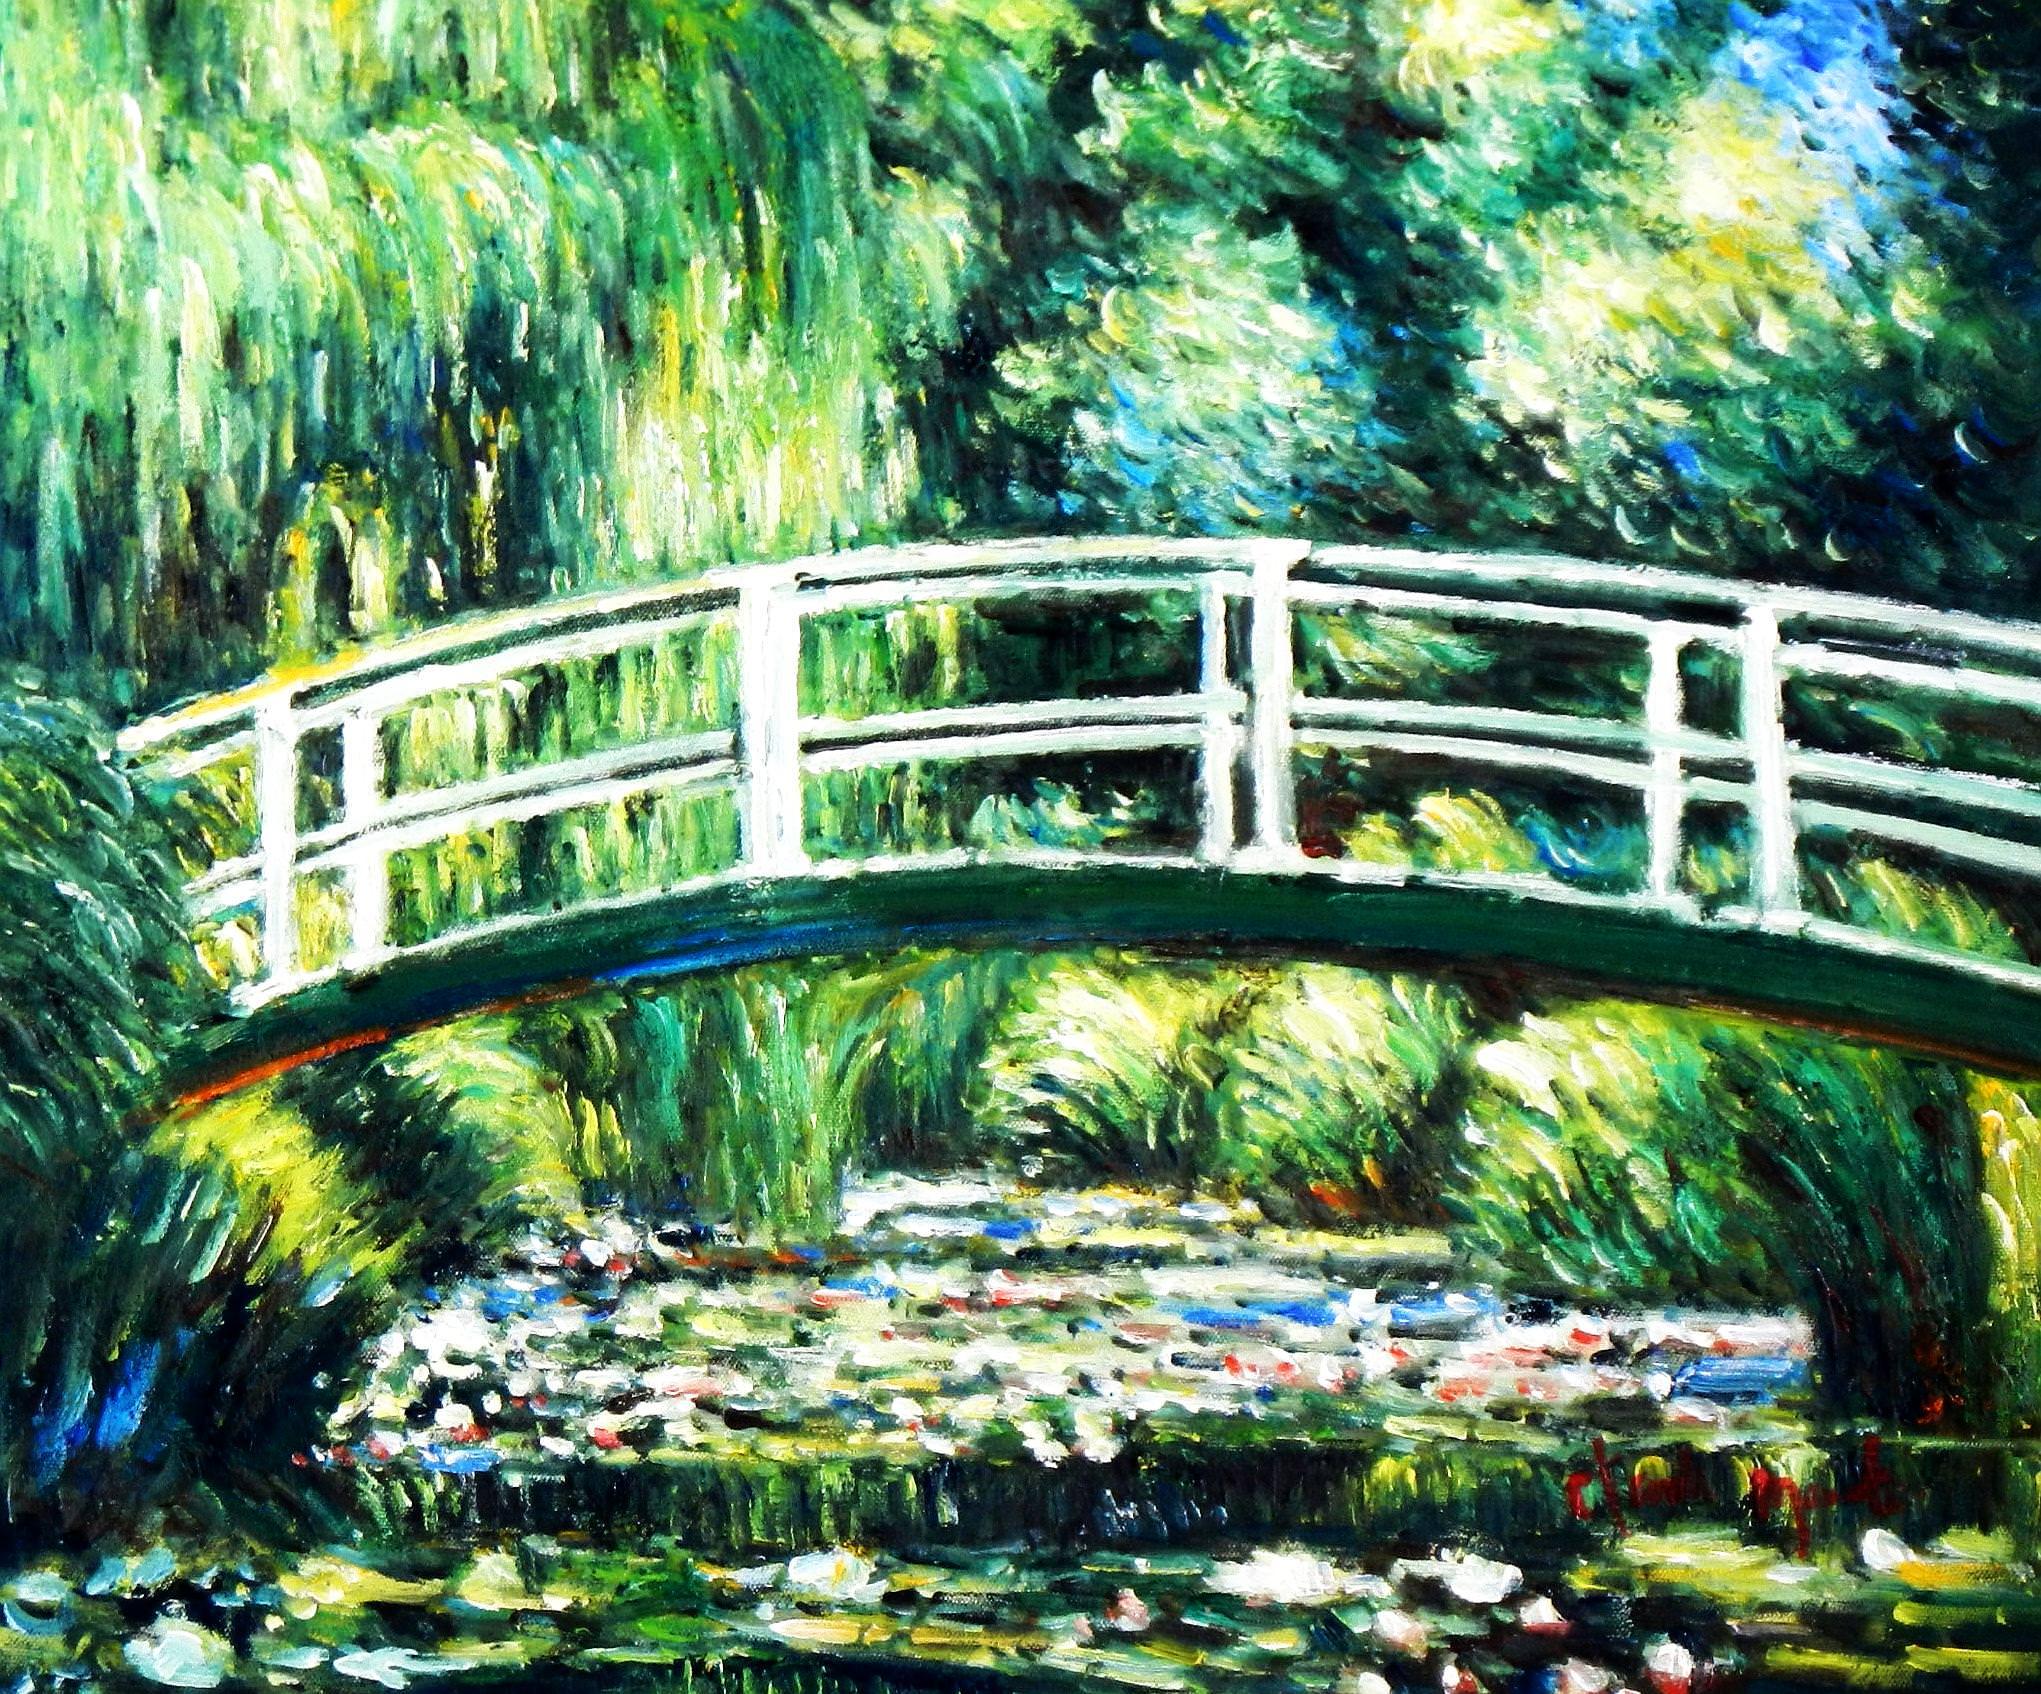 Claude Monet - Brücke über dem Seerosenteich b93881 40x50cm Ölbild handgemalt